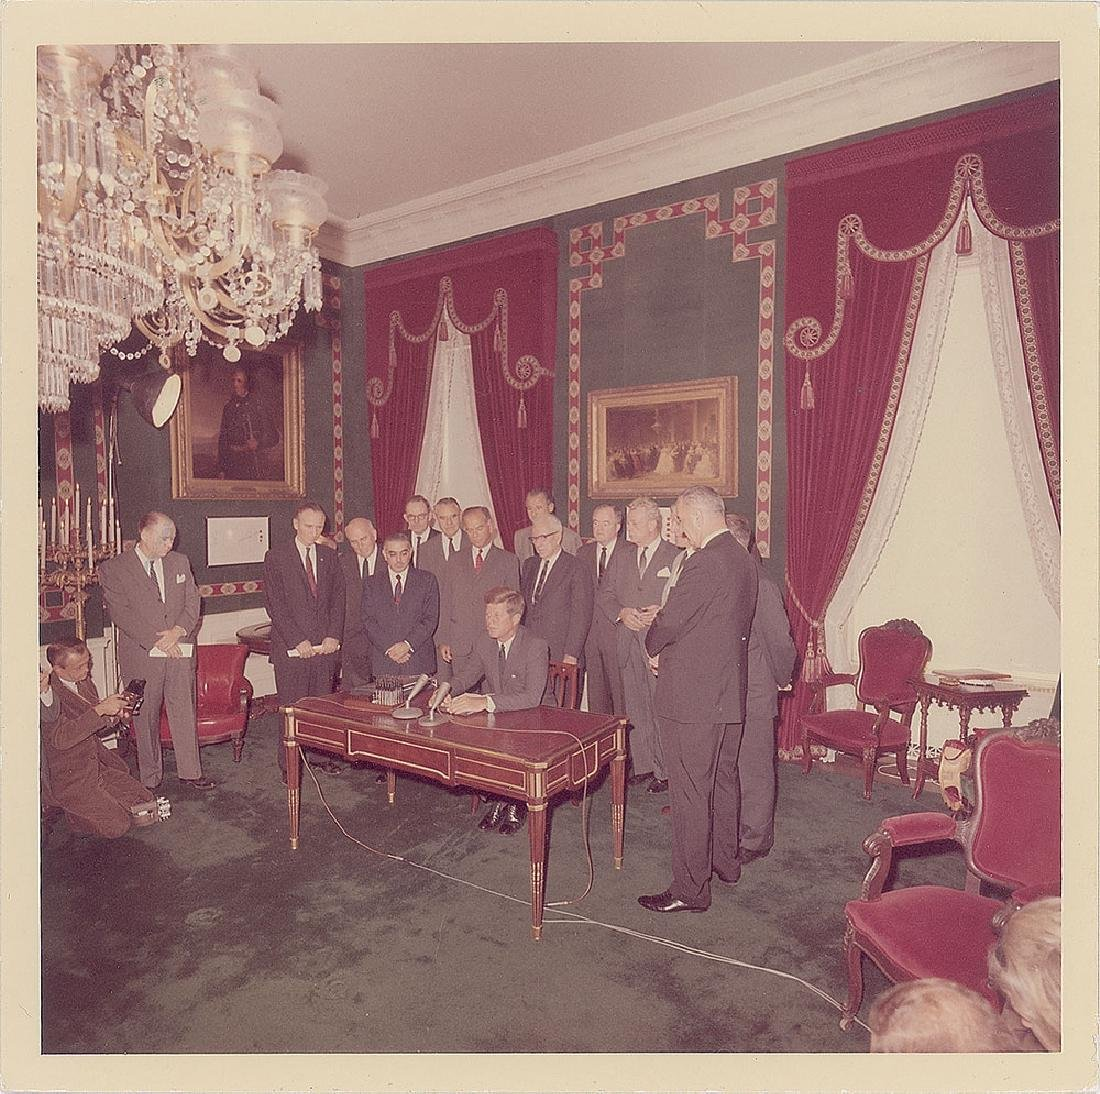 John F. Kennedy Nuclear Test Ban Treaty Original Vintage Photograph by Cecil Stoughton